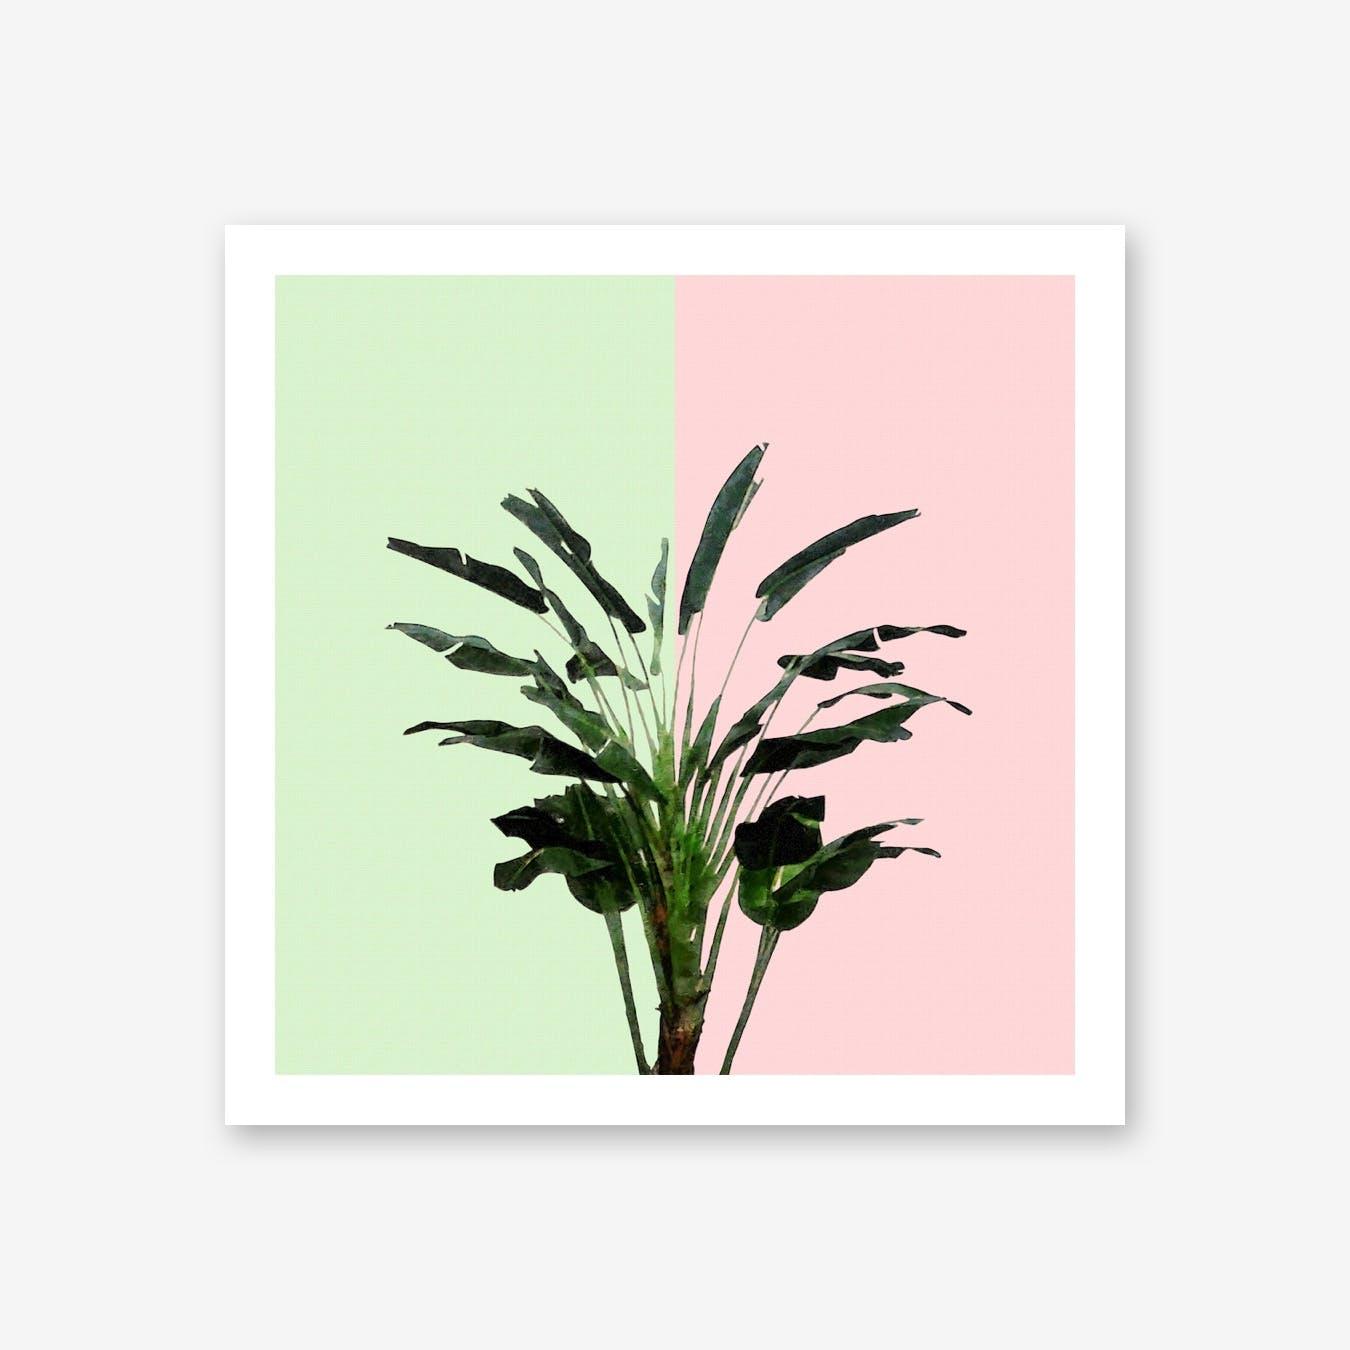 Banana Plant on Pink and Green Wall